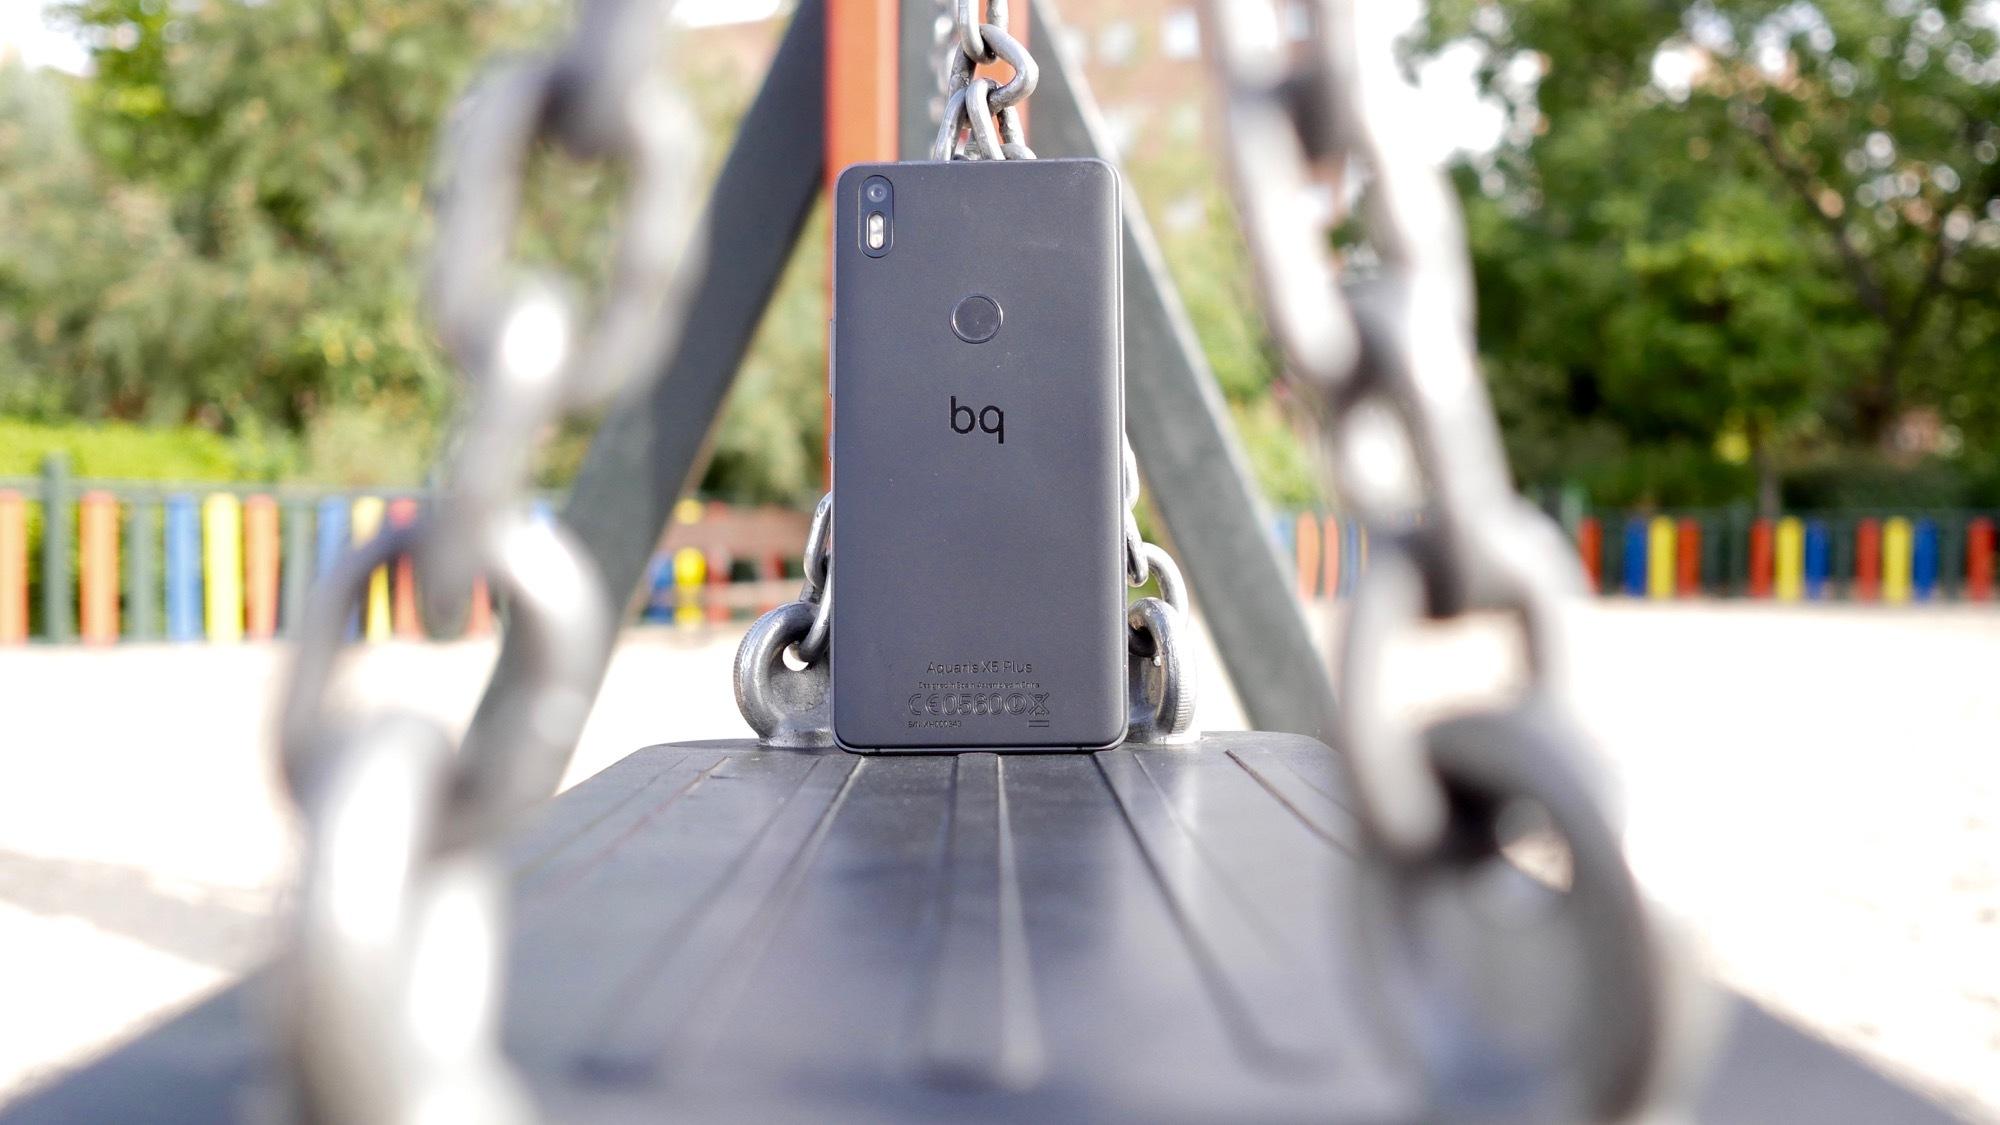 Diseño BQ Aquaris X5 Plus